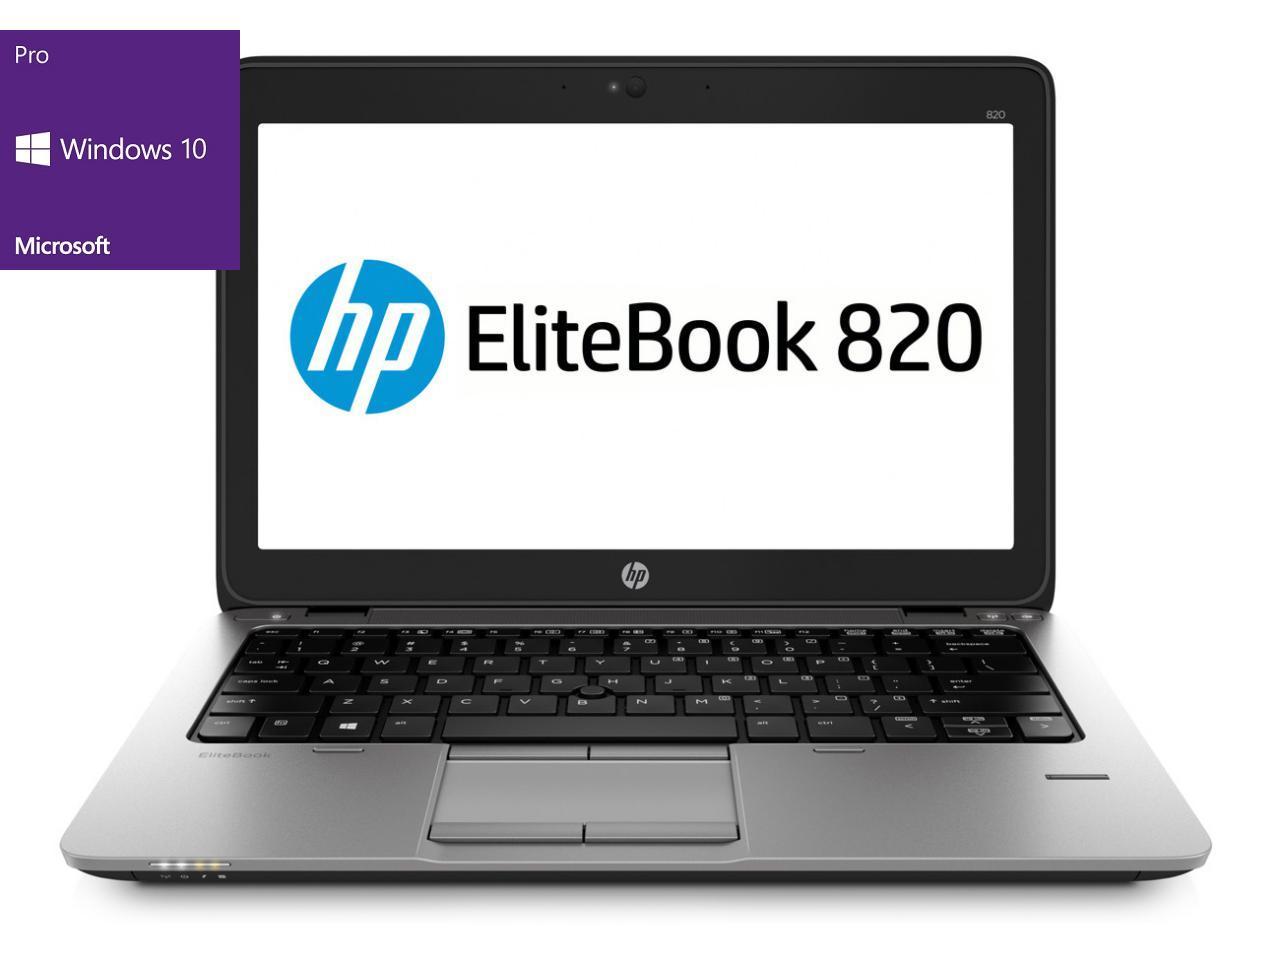 Hewlett Packard EliteBook 820 G2